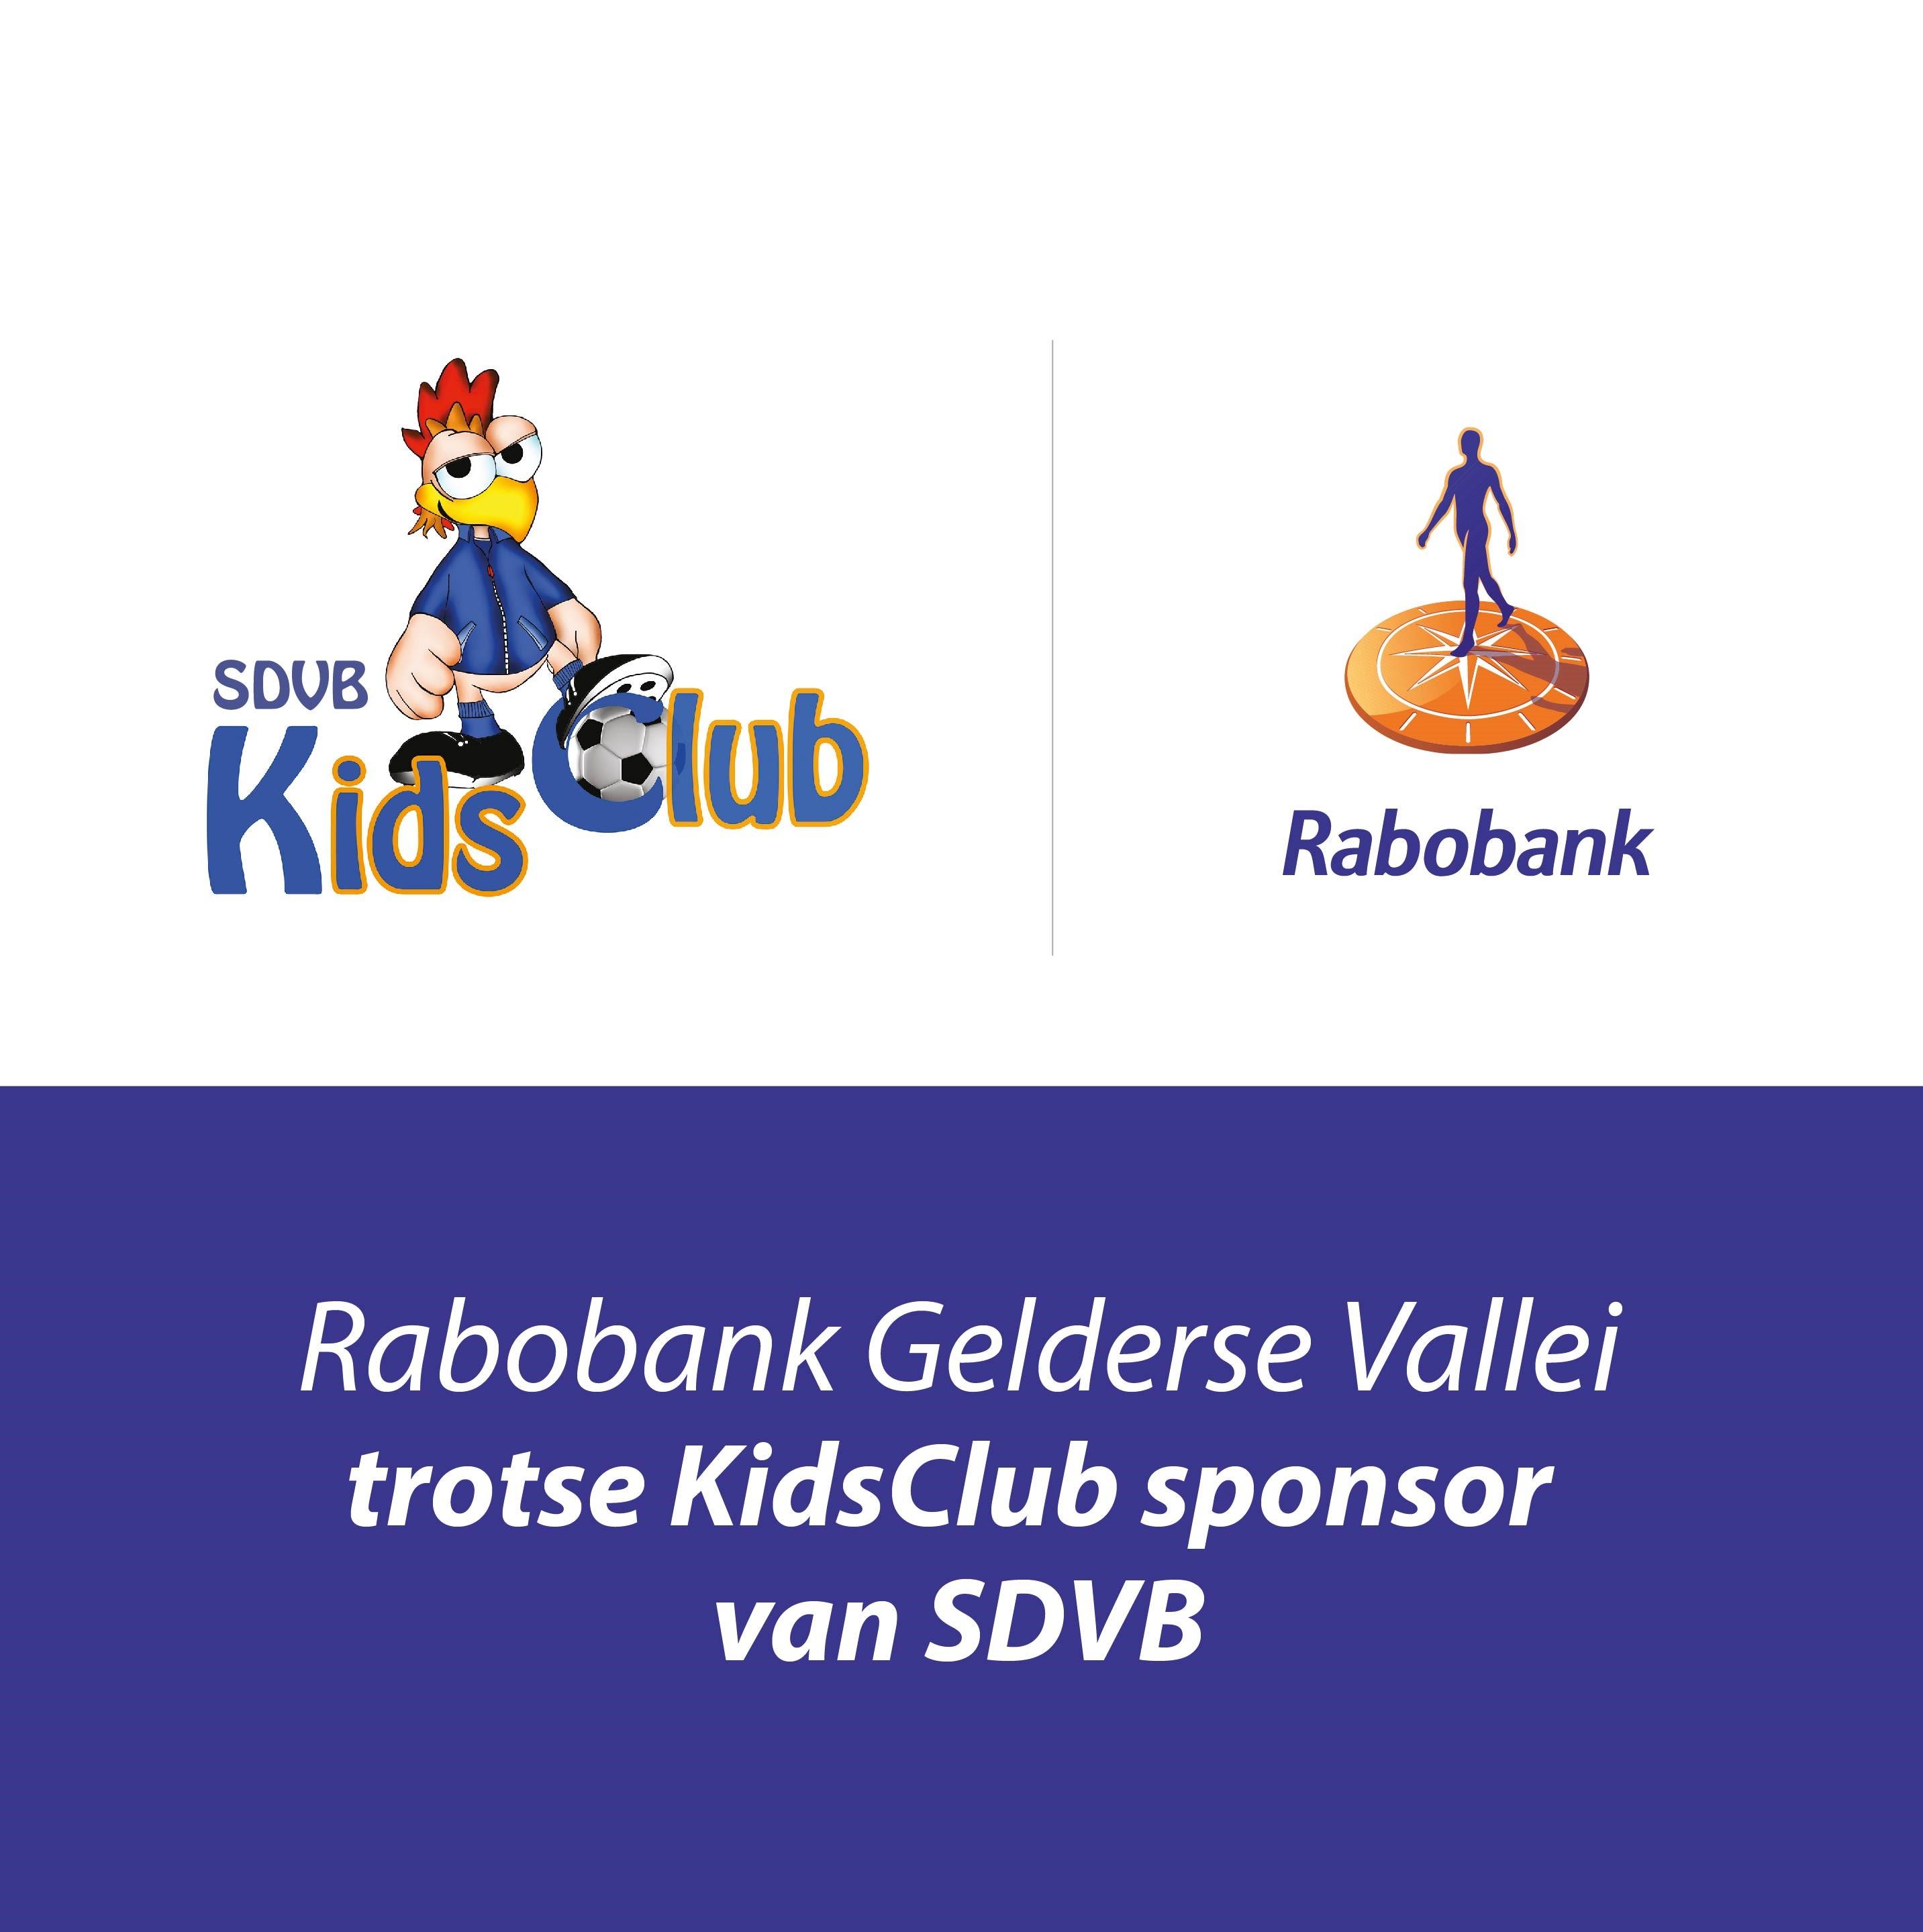 Rabobank trotse sponsor van SDVB kidsclub